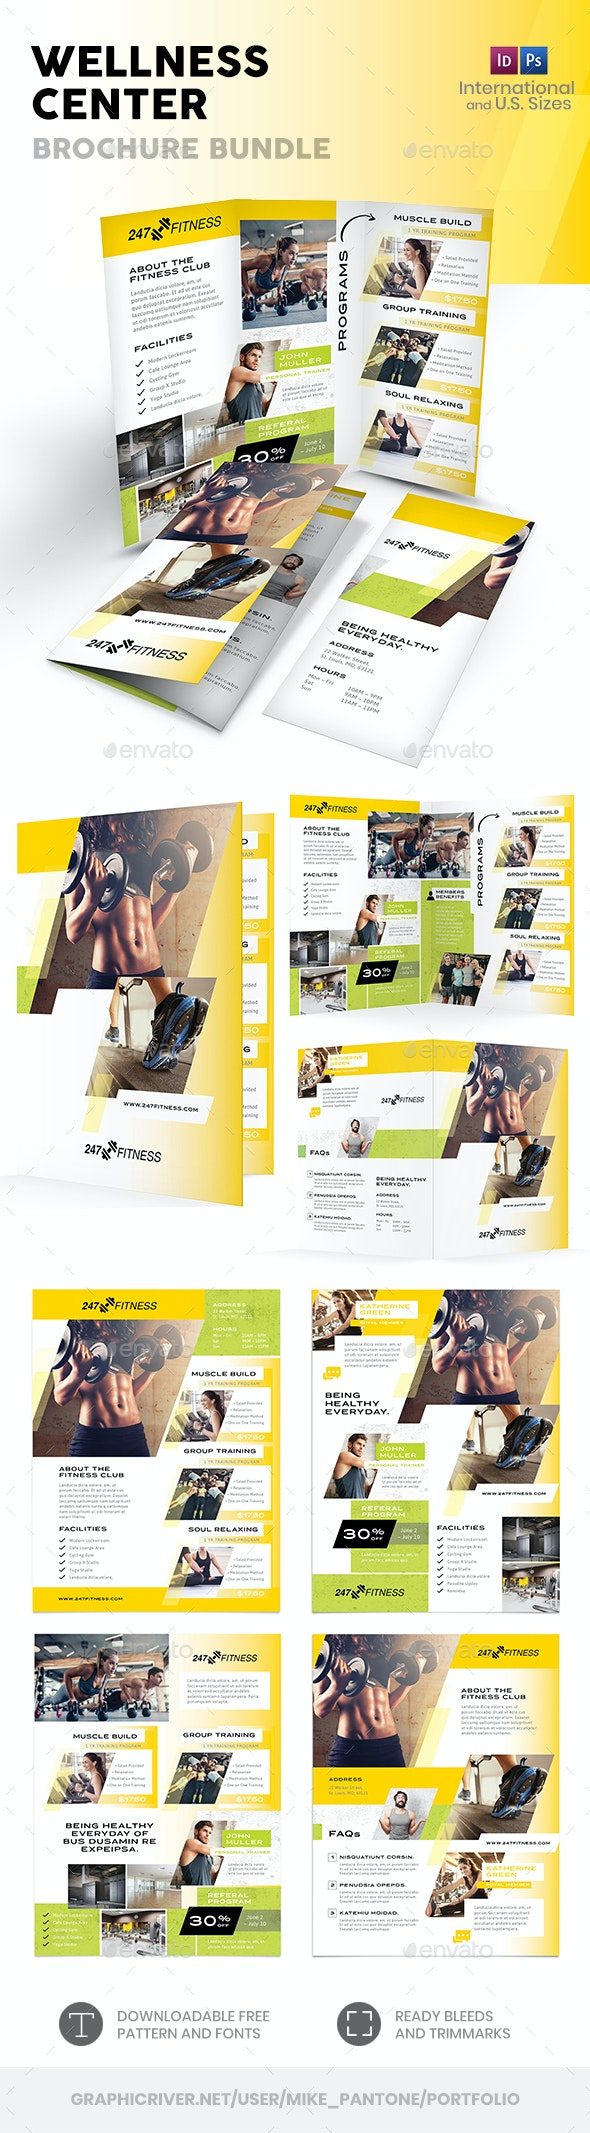 Wellness Center Print Bundle 3 - Informational Brochures